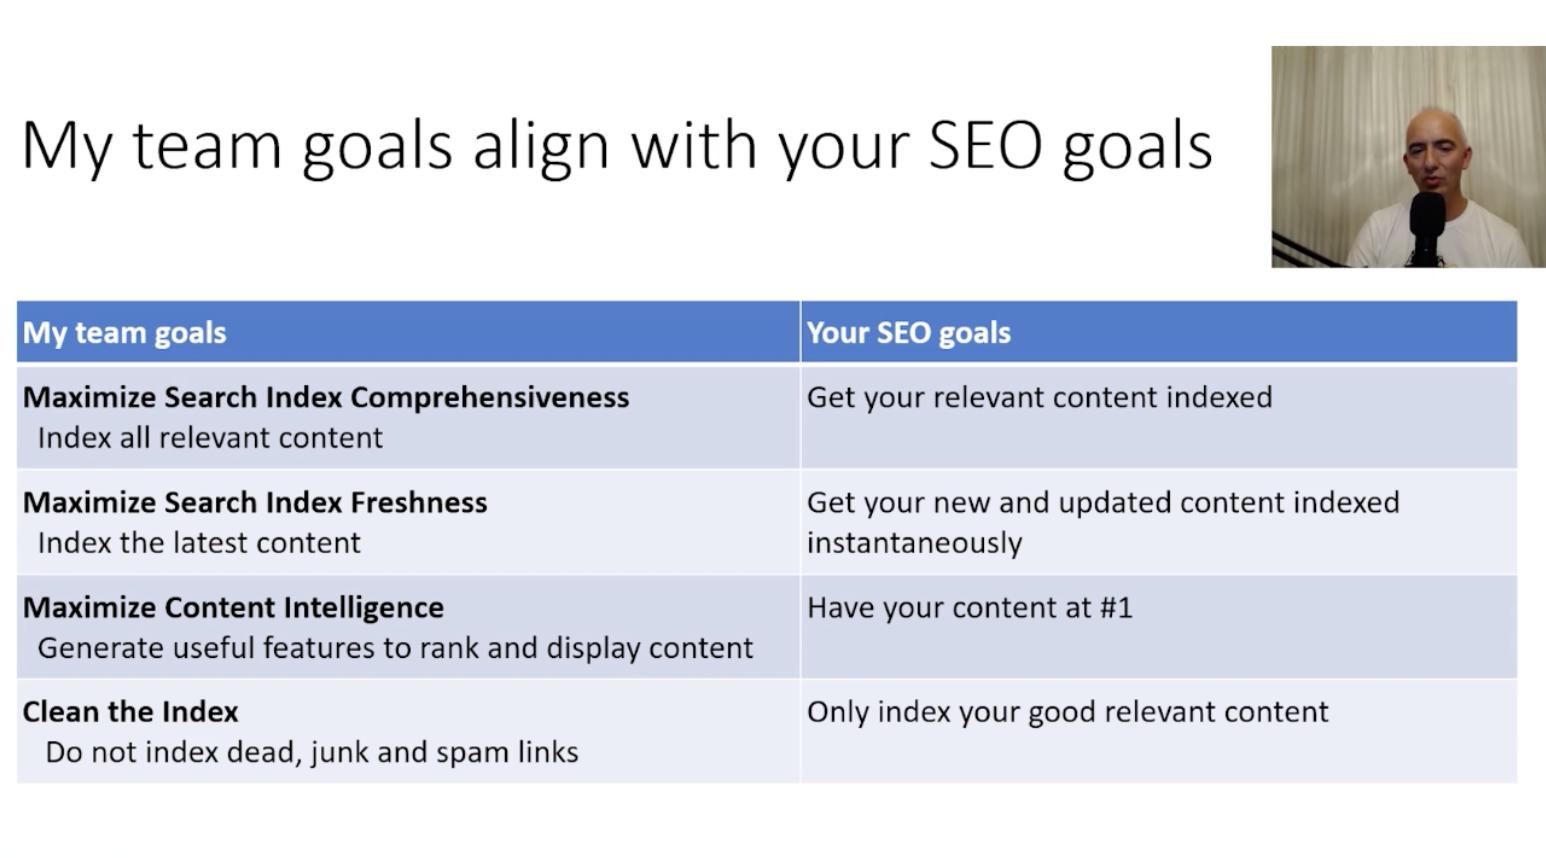 Bing goals